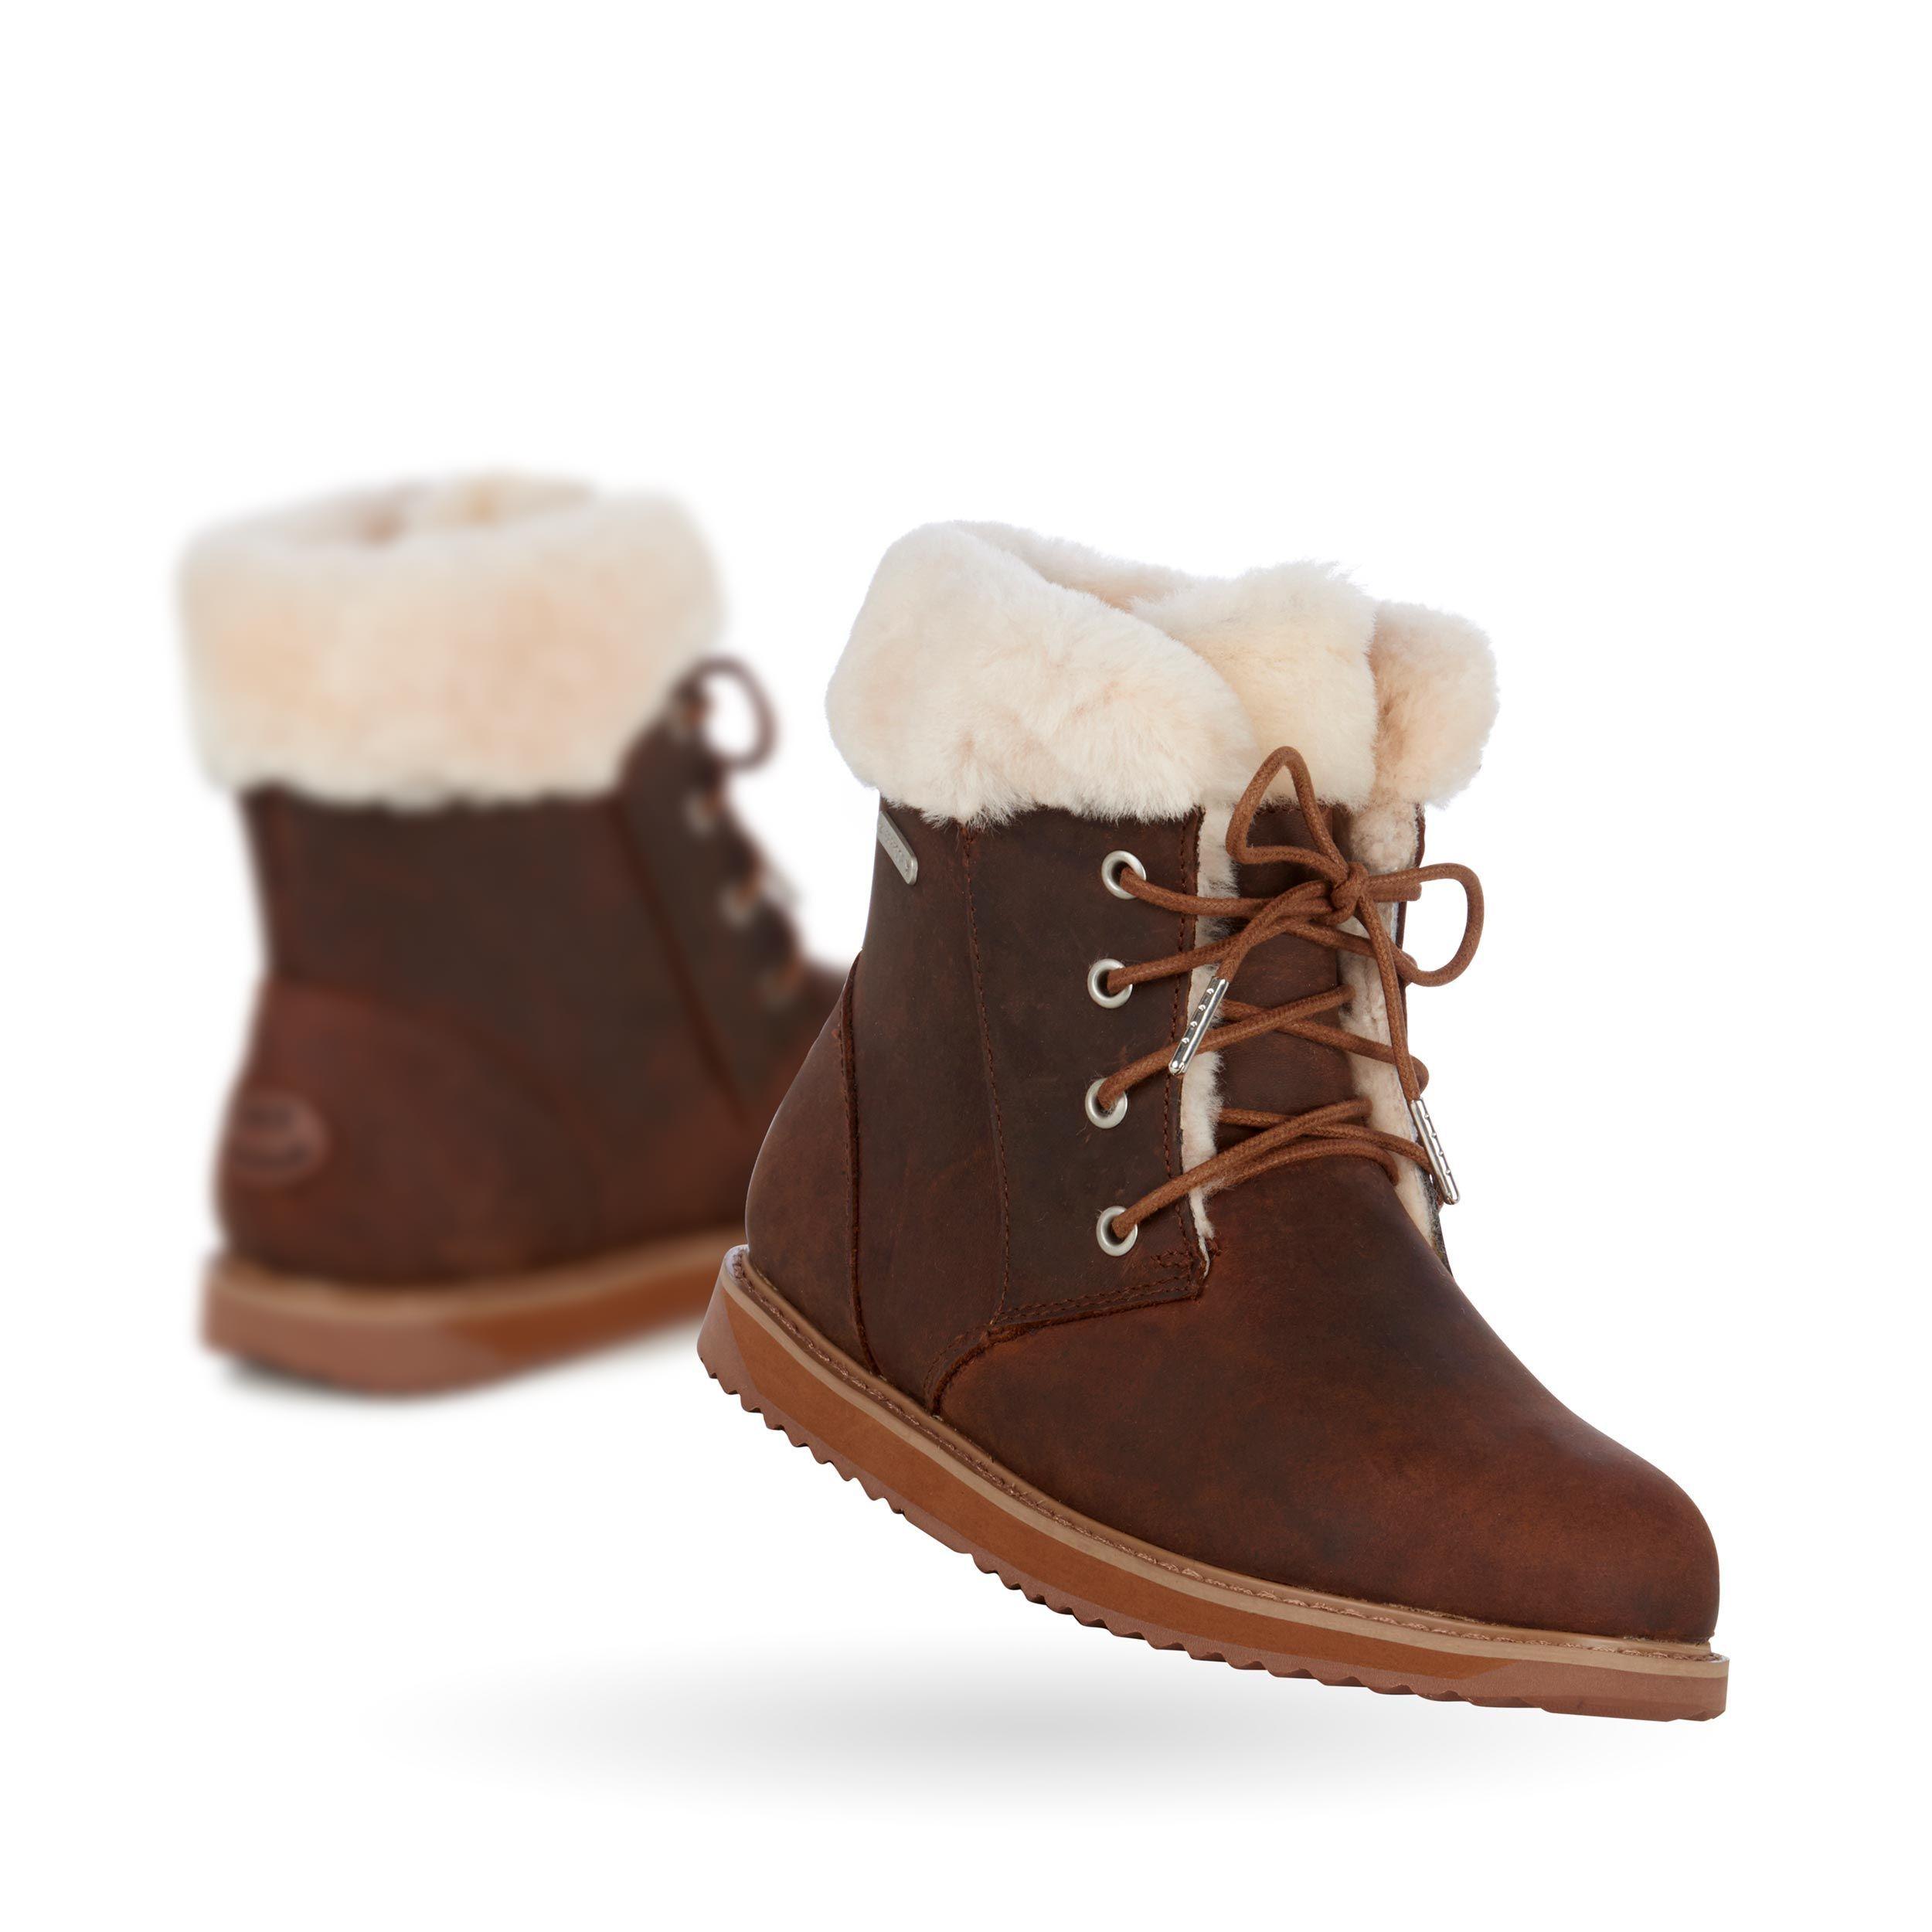 sheepskin lace up boots